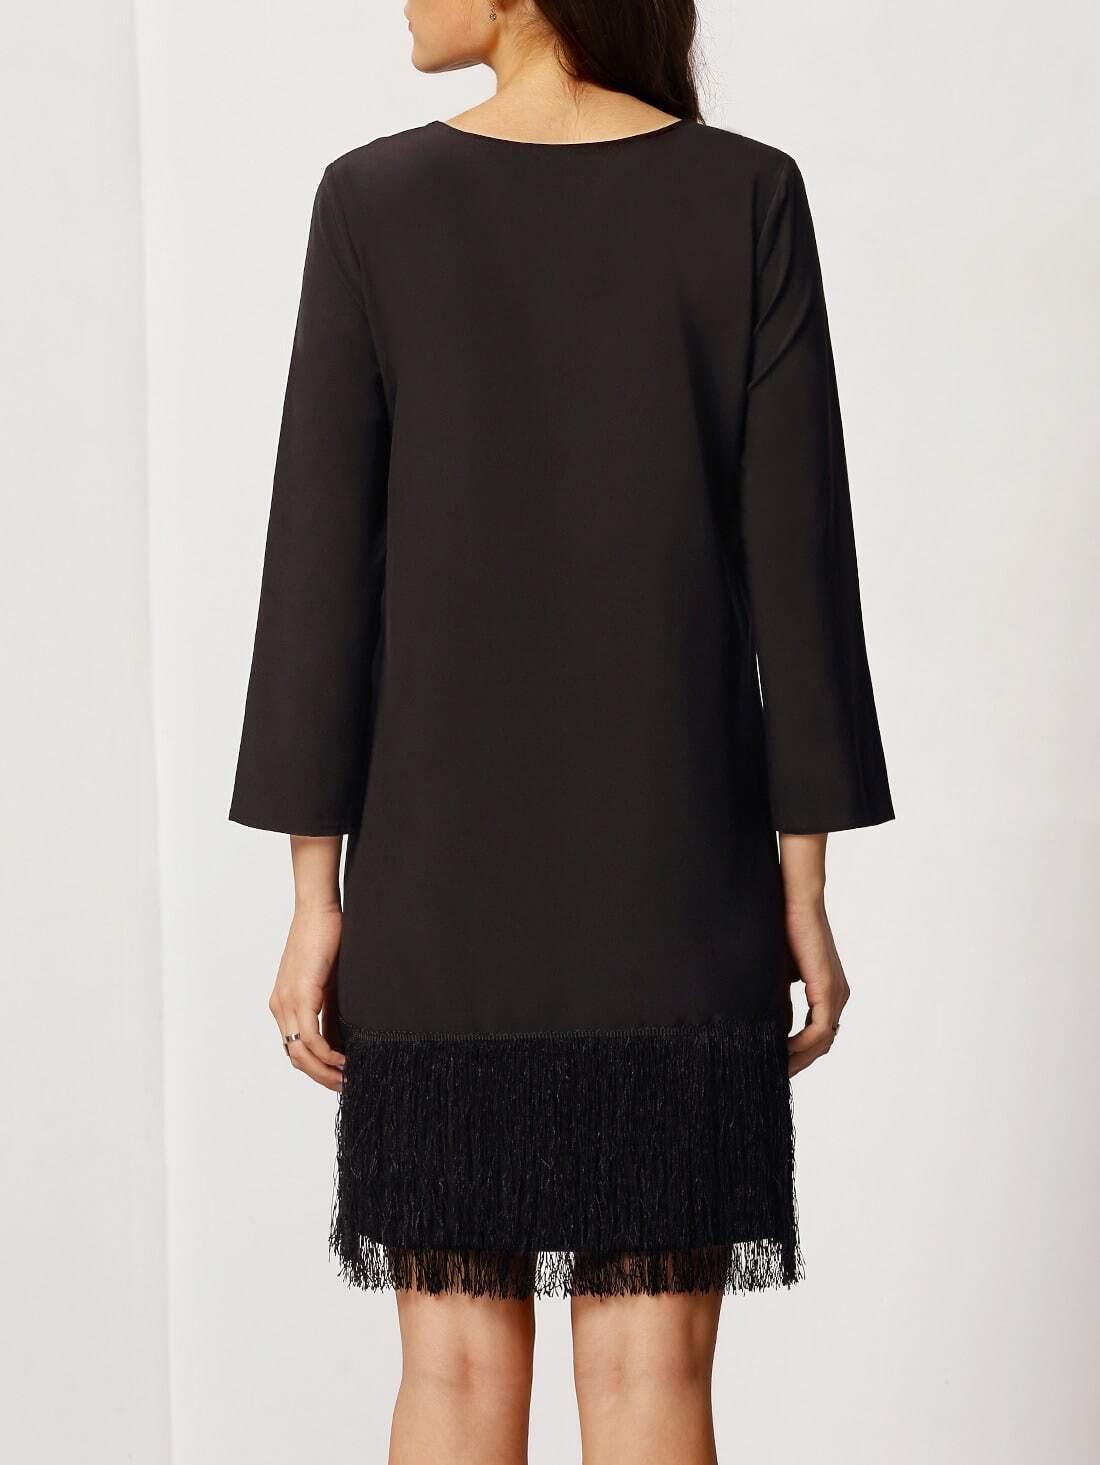 robe franges manches longues noir. Black Bedroom Furniture Sets. Home Design Ideas